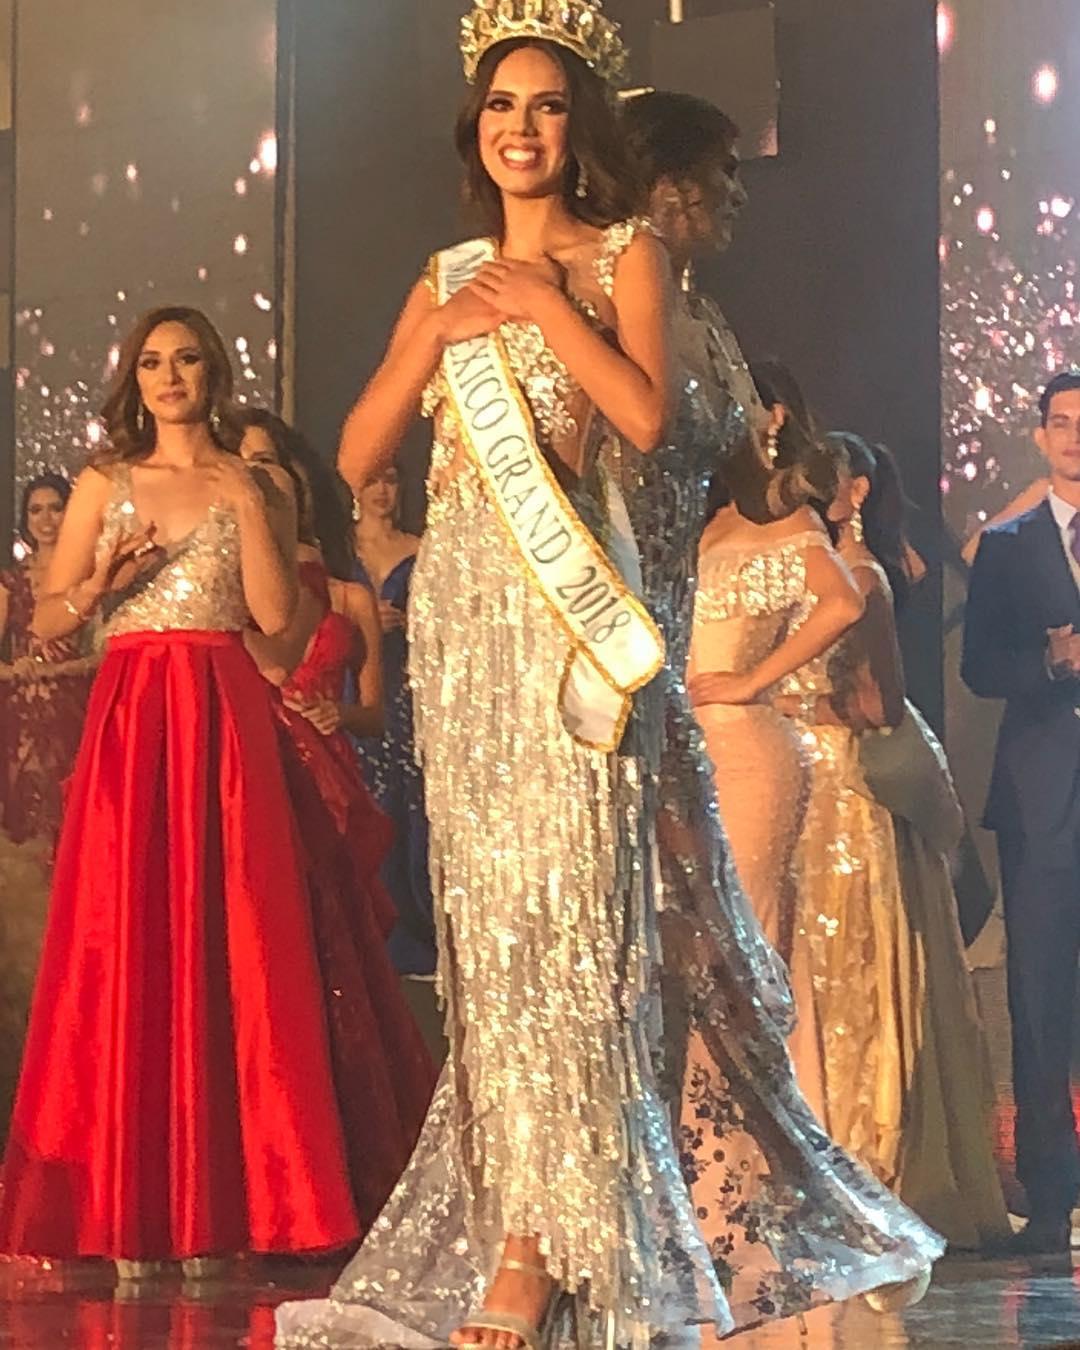 lezly diaz, top 10 de miss grand international 2018. - Página 2 30913910